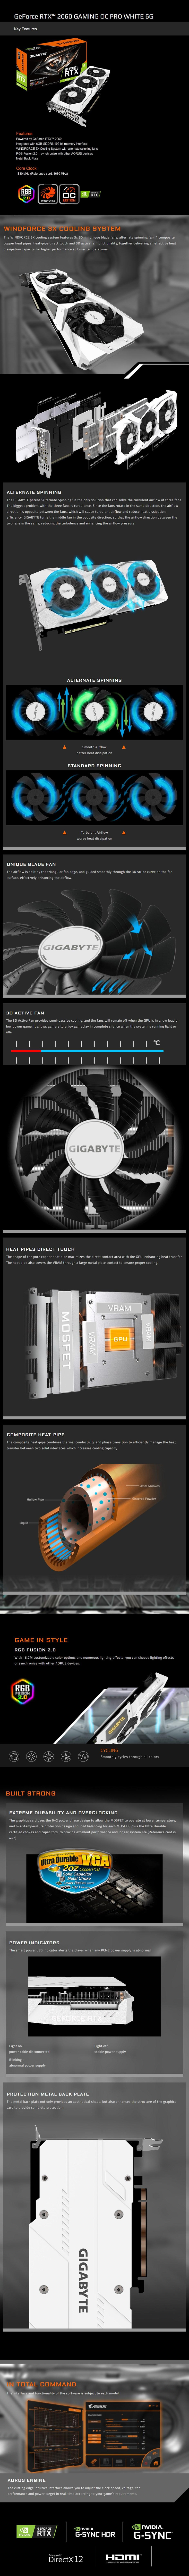 Gigabyte GeForce RTX 2060 GAMING OC PRO WHITE 6GB Video Card - Desktop Overview 1